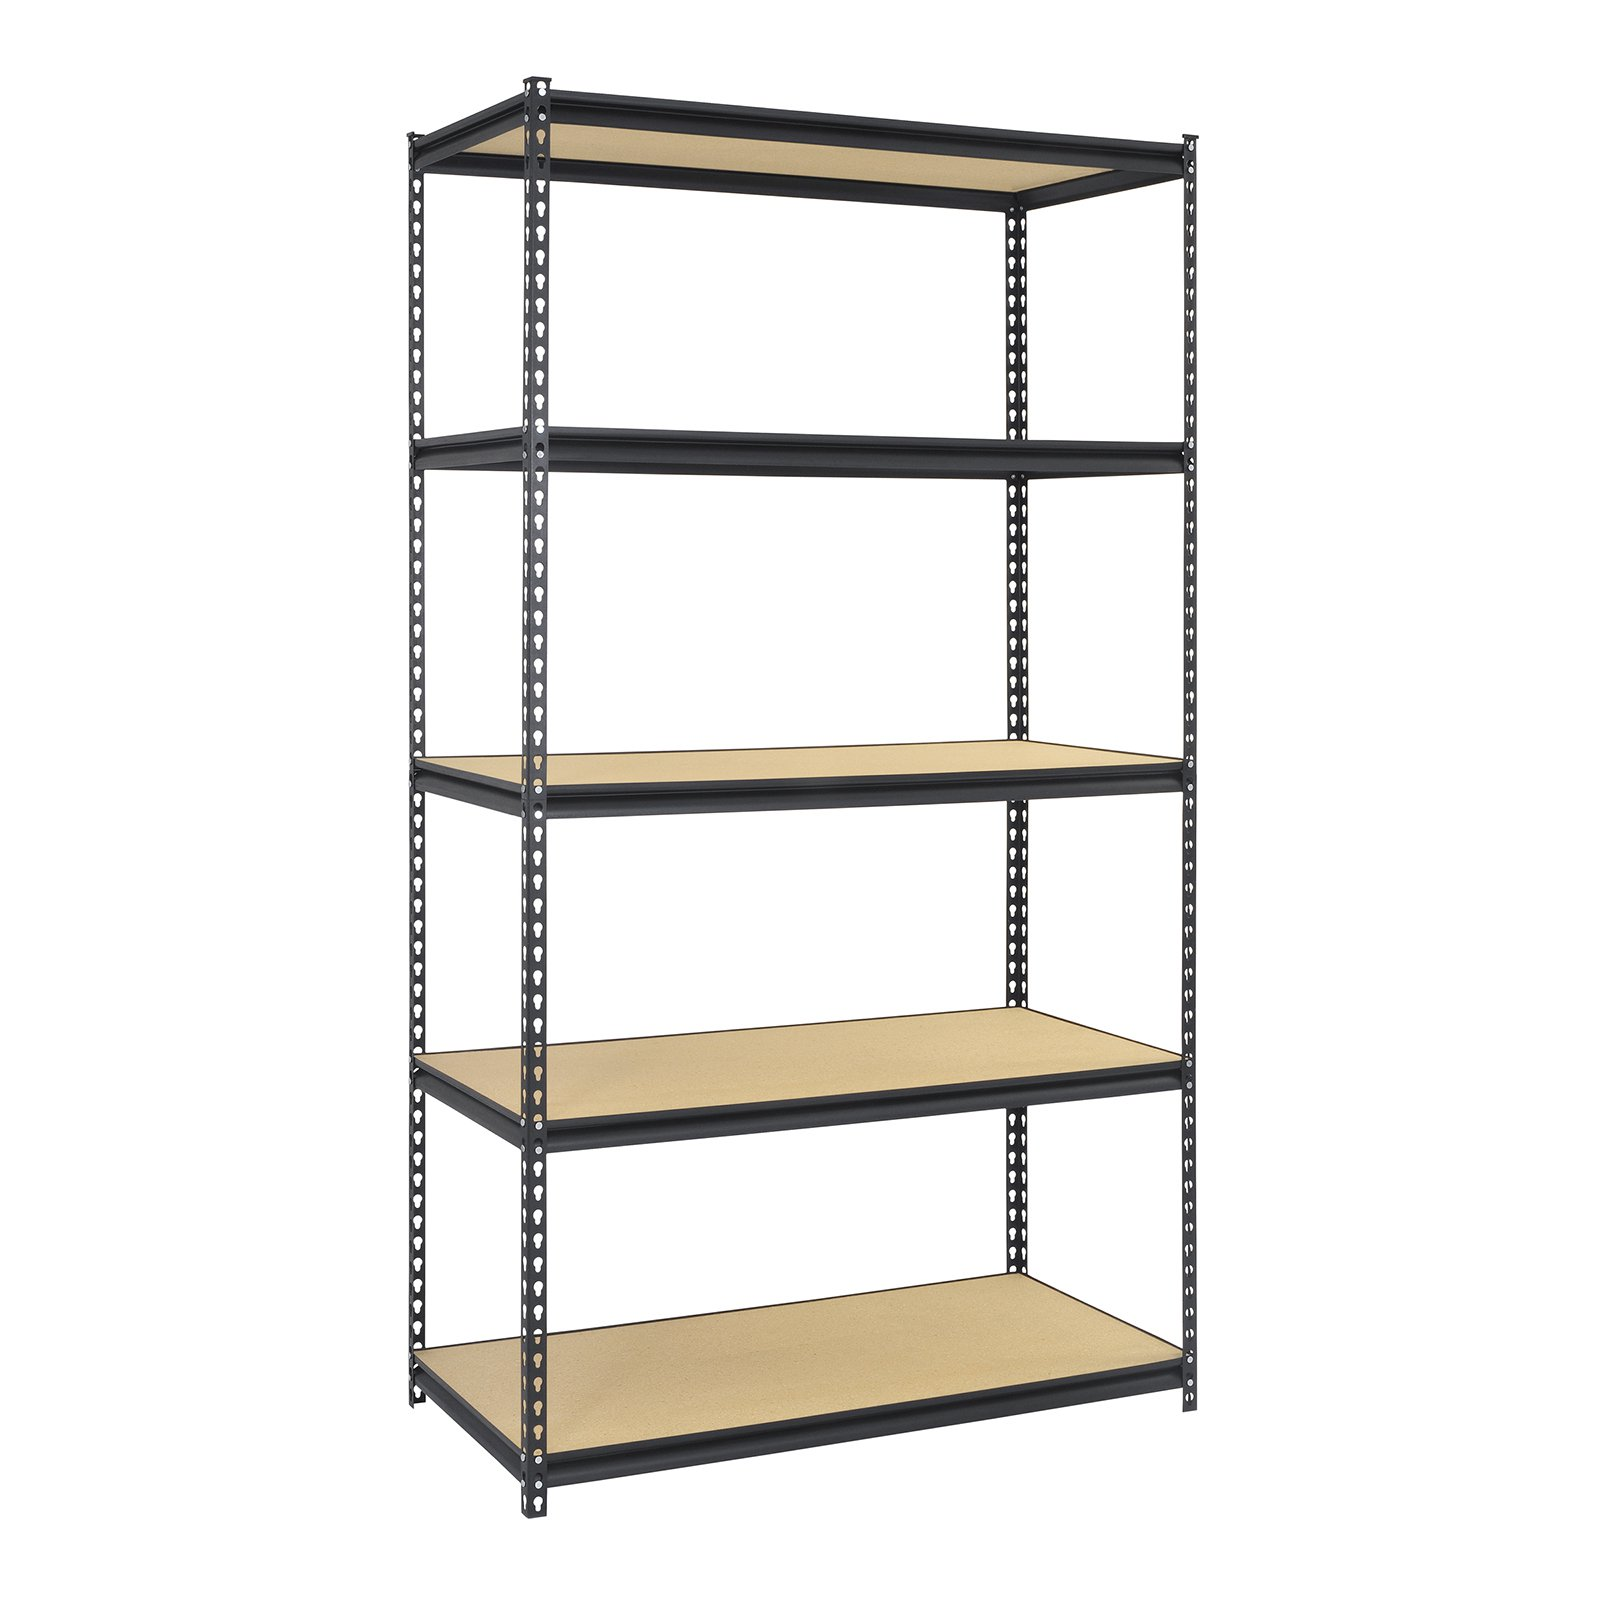 Muscle Rack 5 Shelf Storage Rack Steel Shelving Unit Steel